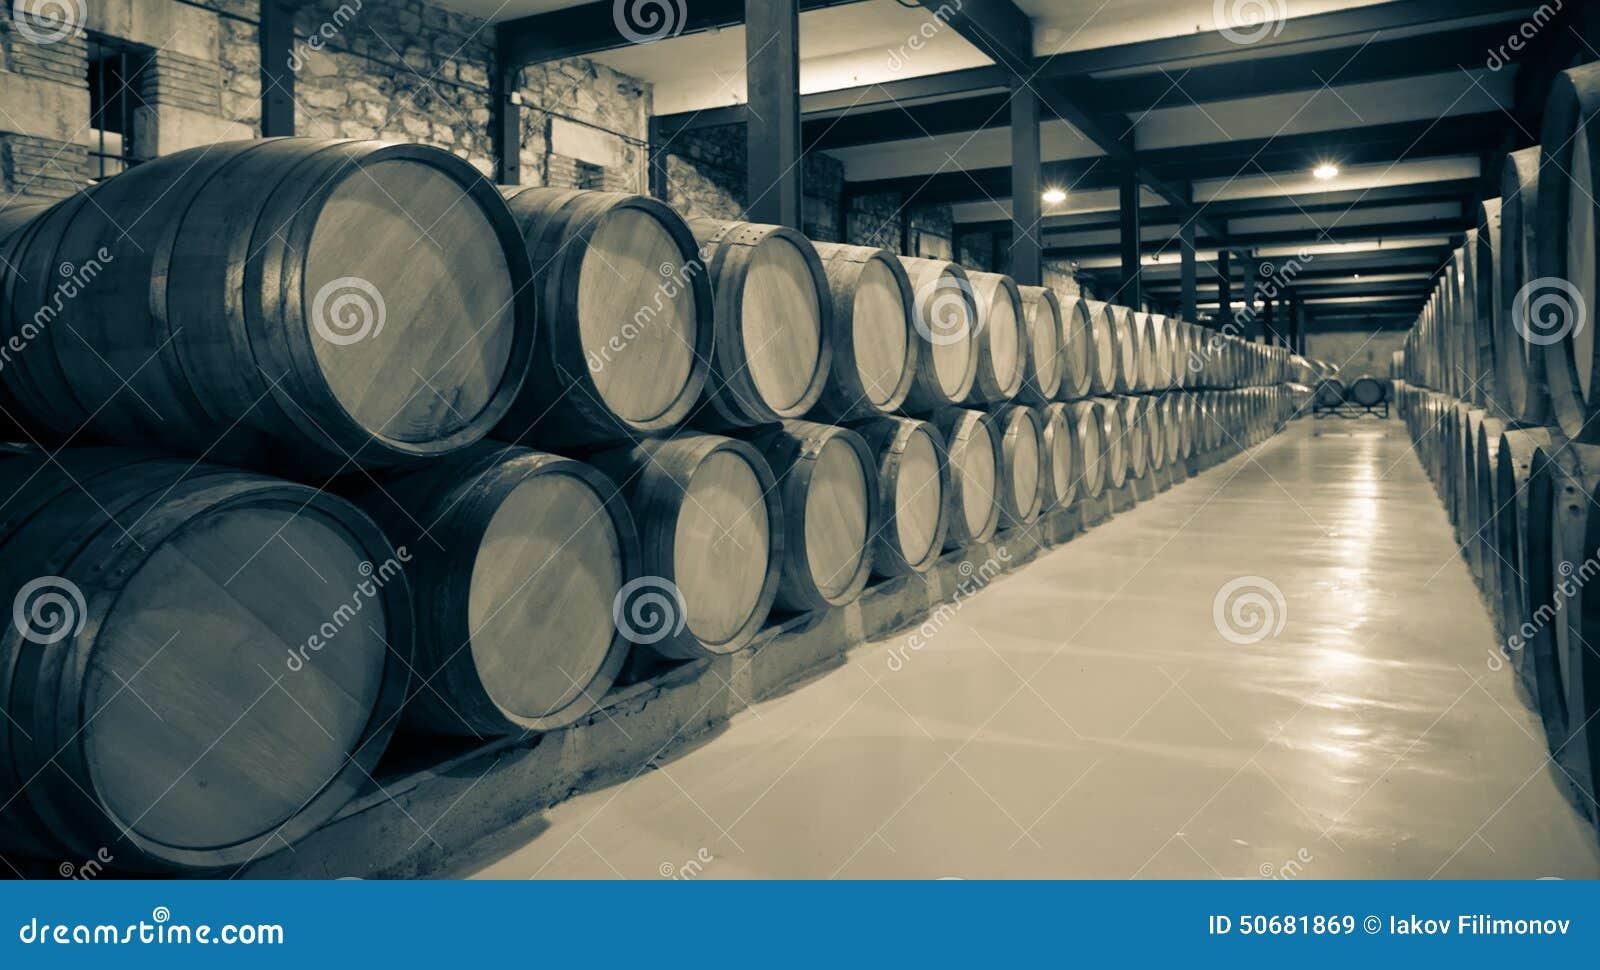 Download 酿酒厂年迈的照片 库存图片. 图片 包括有 香槟, 纬向条花, 地窖, 酒精, 对象, 许多, 小桶, 行业 - 50681869